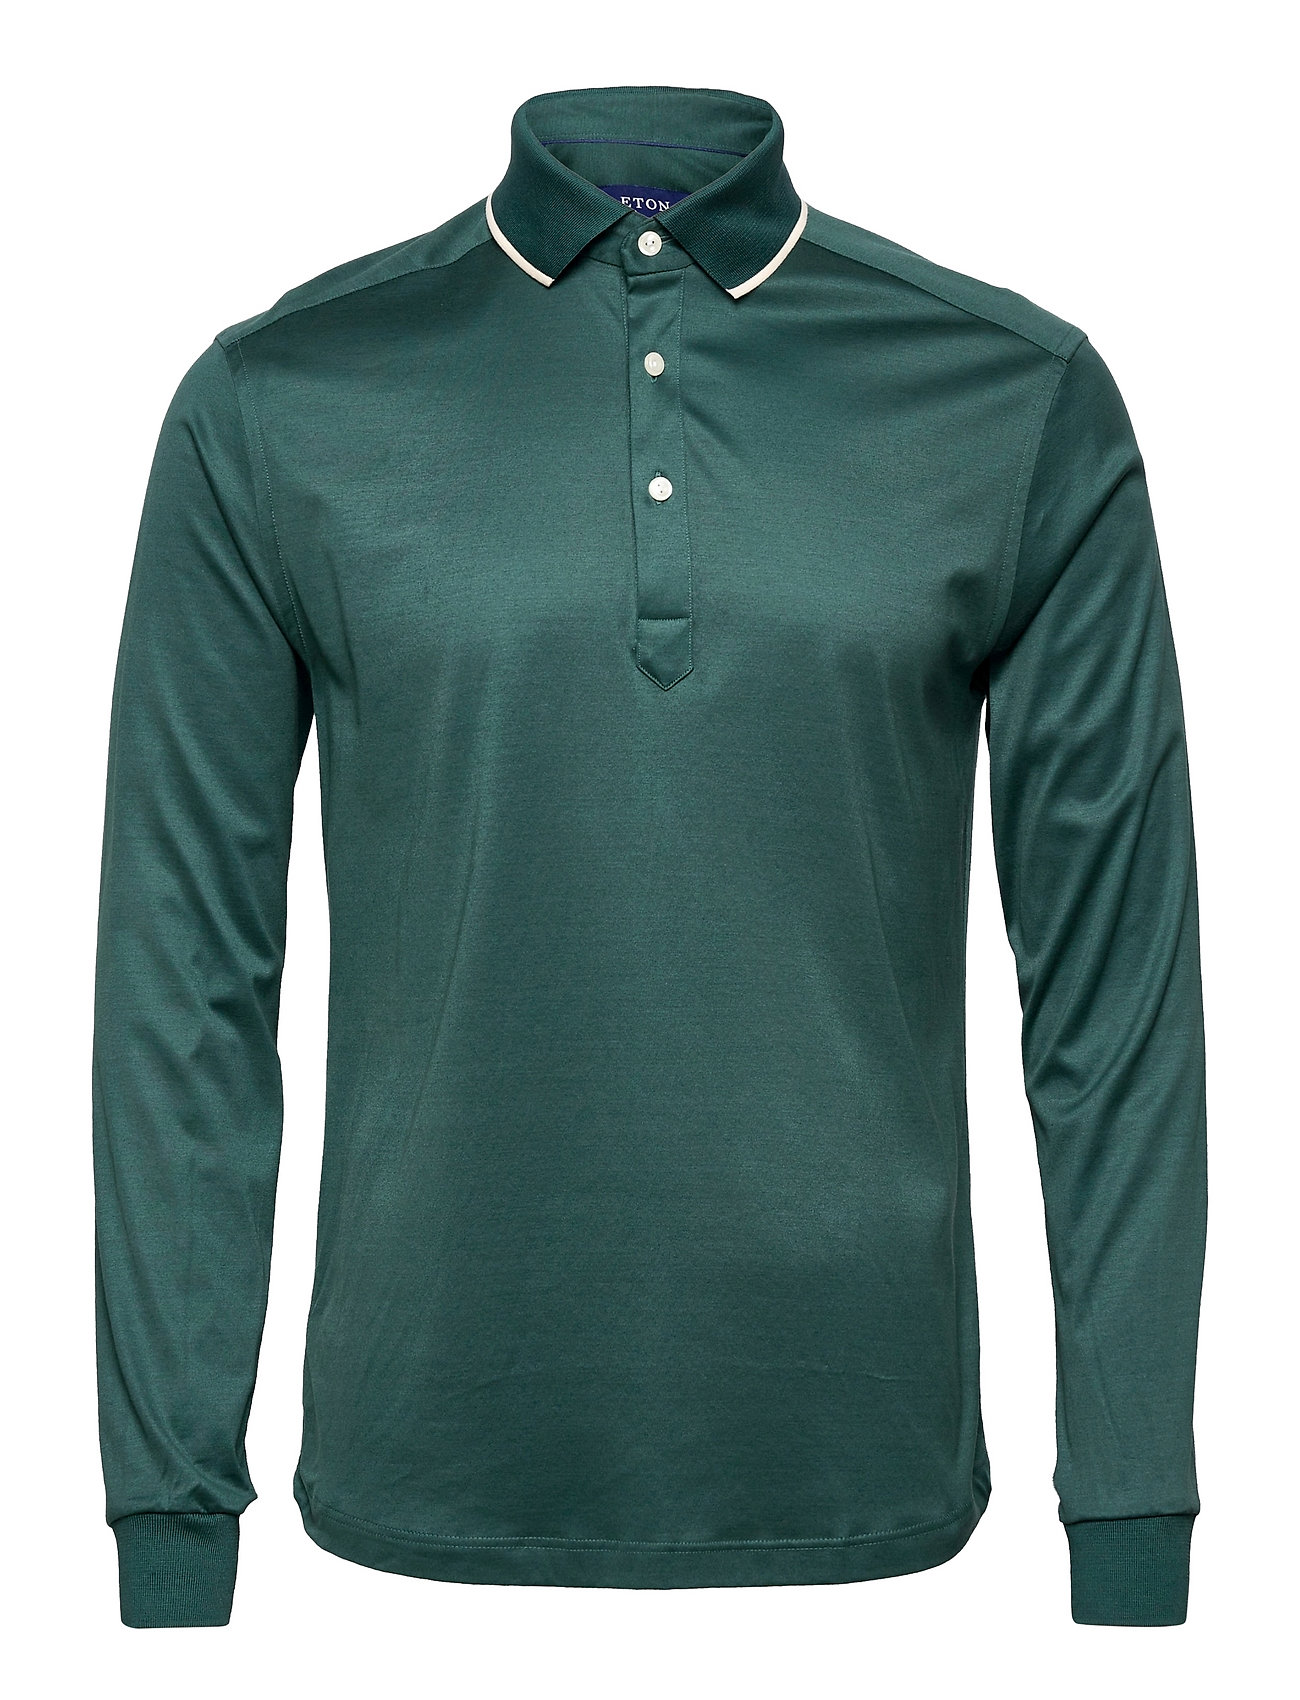 Men'S Shirt: Casual Jersey Polos Long-sleeved Grøn Eton